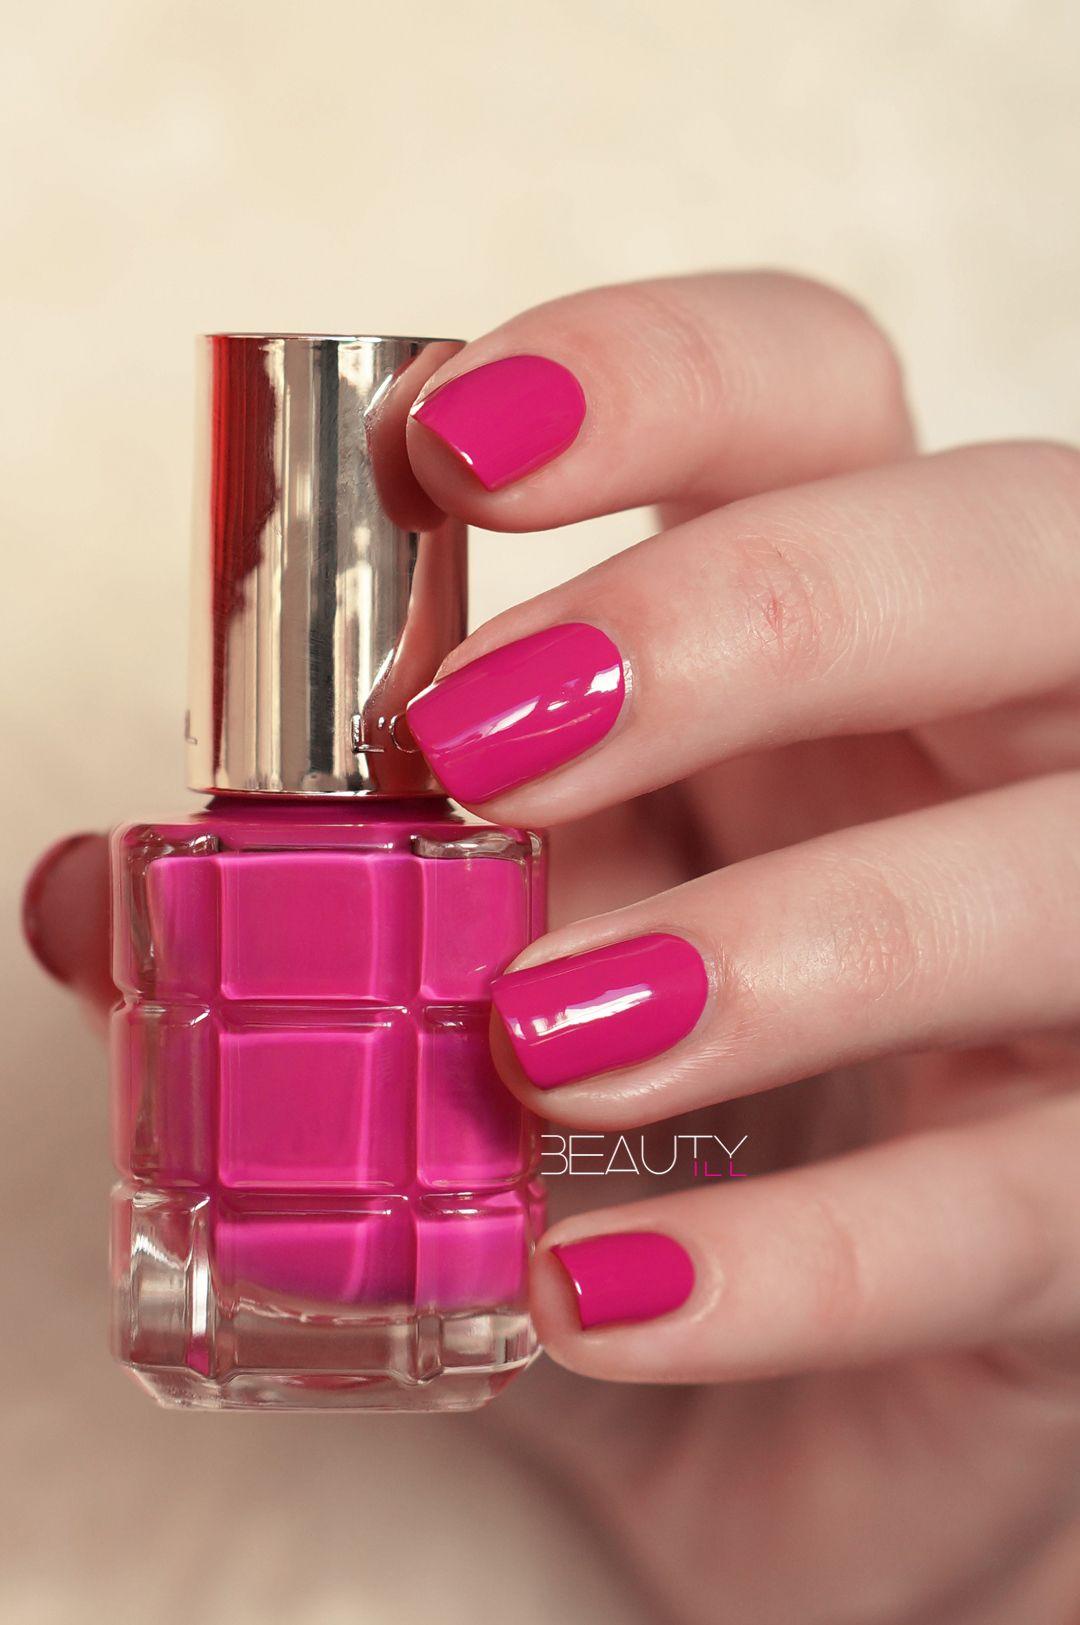 Fuchsia Palace, new Loreal color Richie L\'Huile Nail Polish. This ...